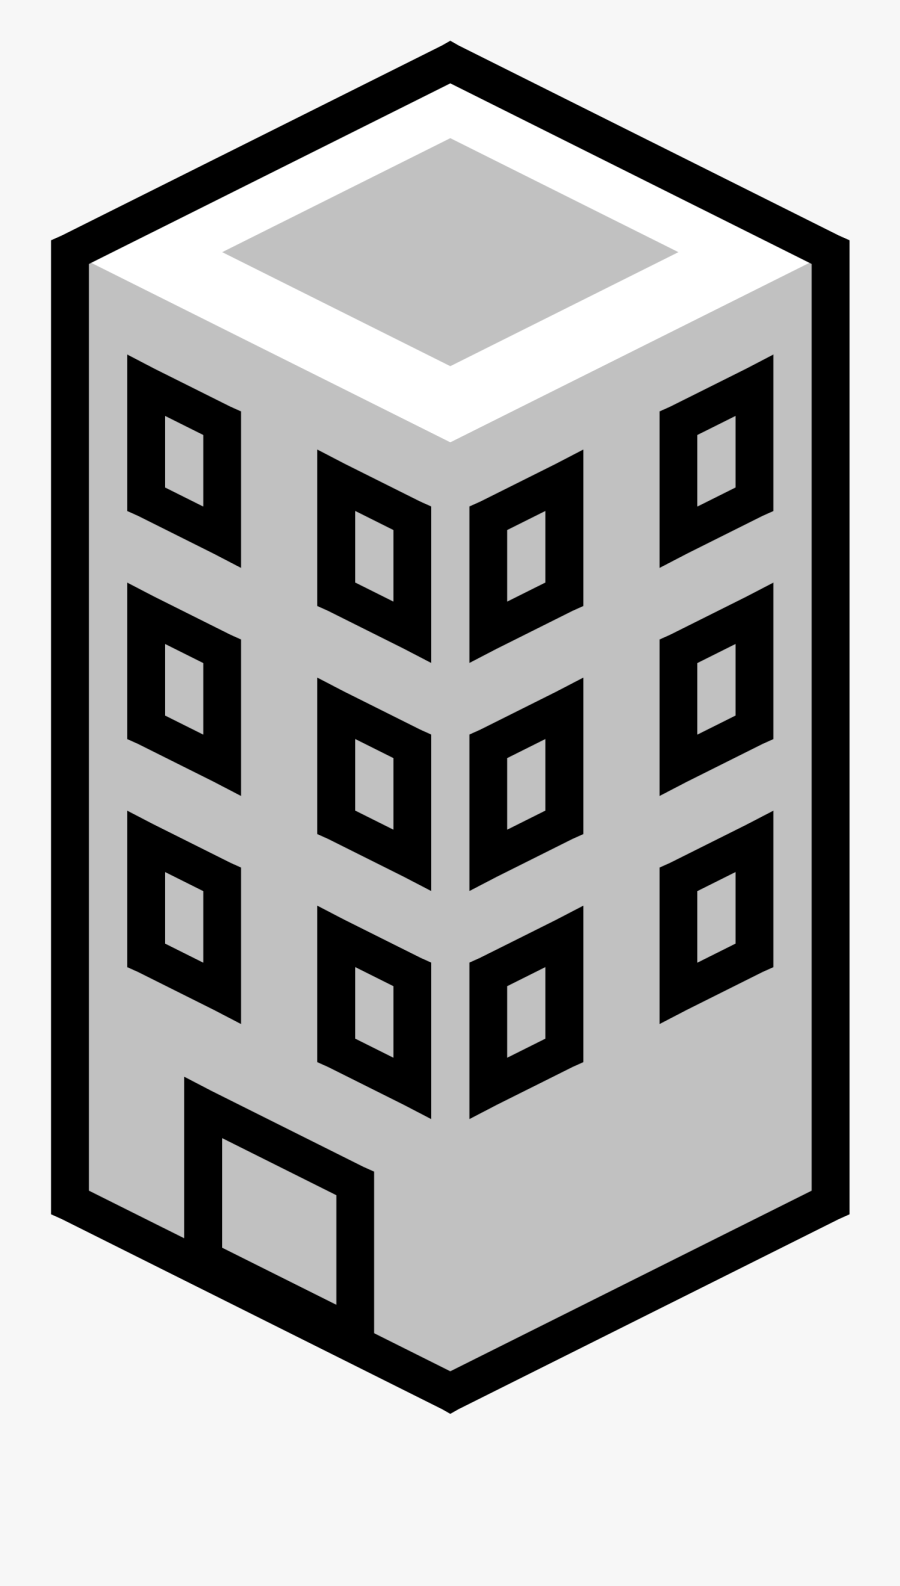 Big Image Png - Building Clipart, Transparent Clipart